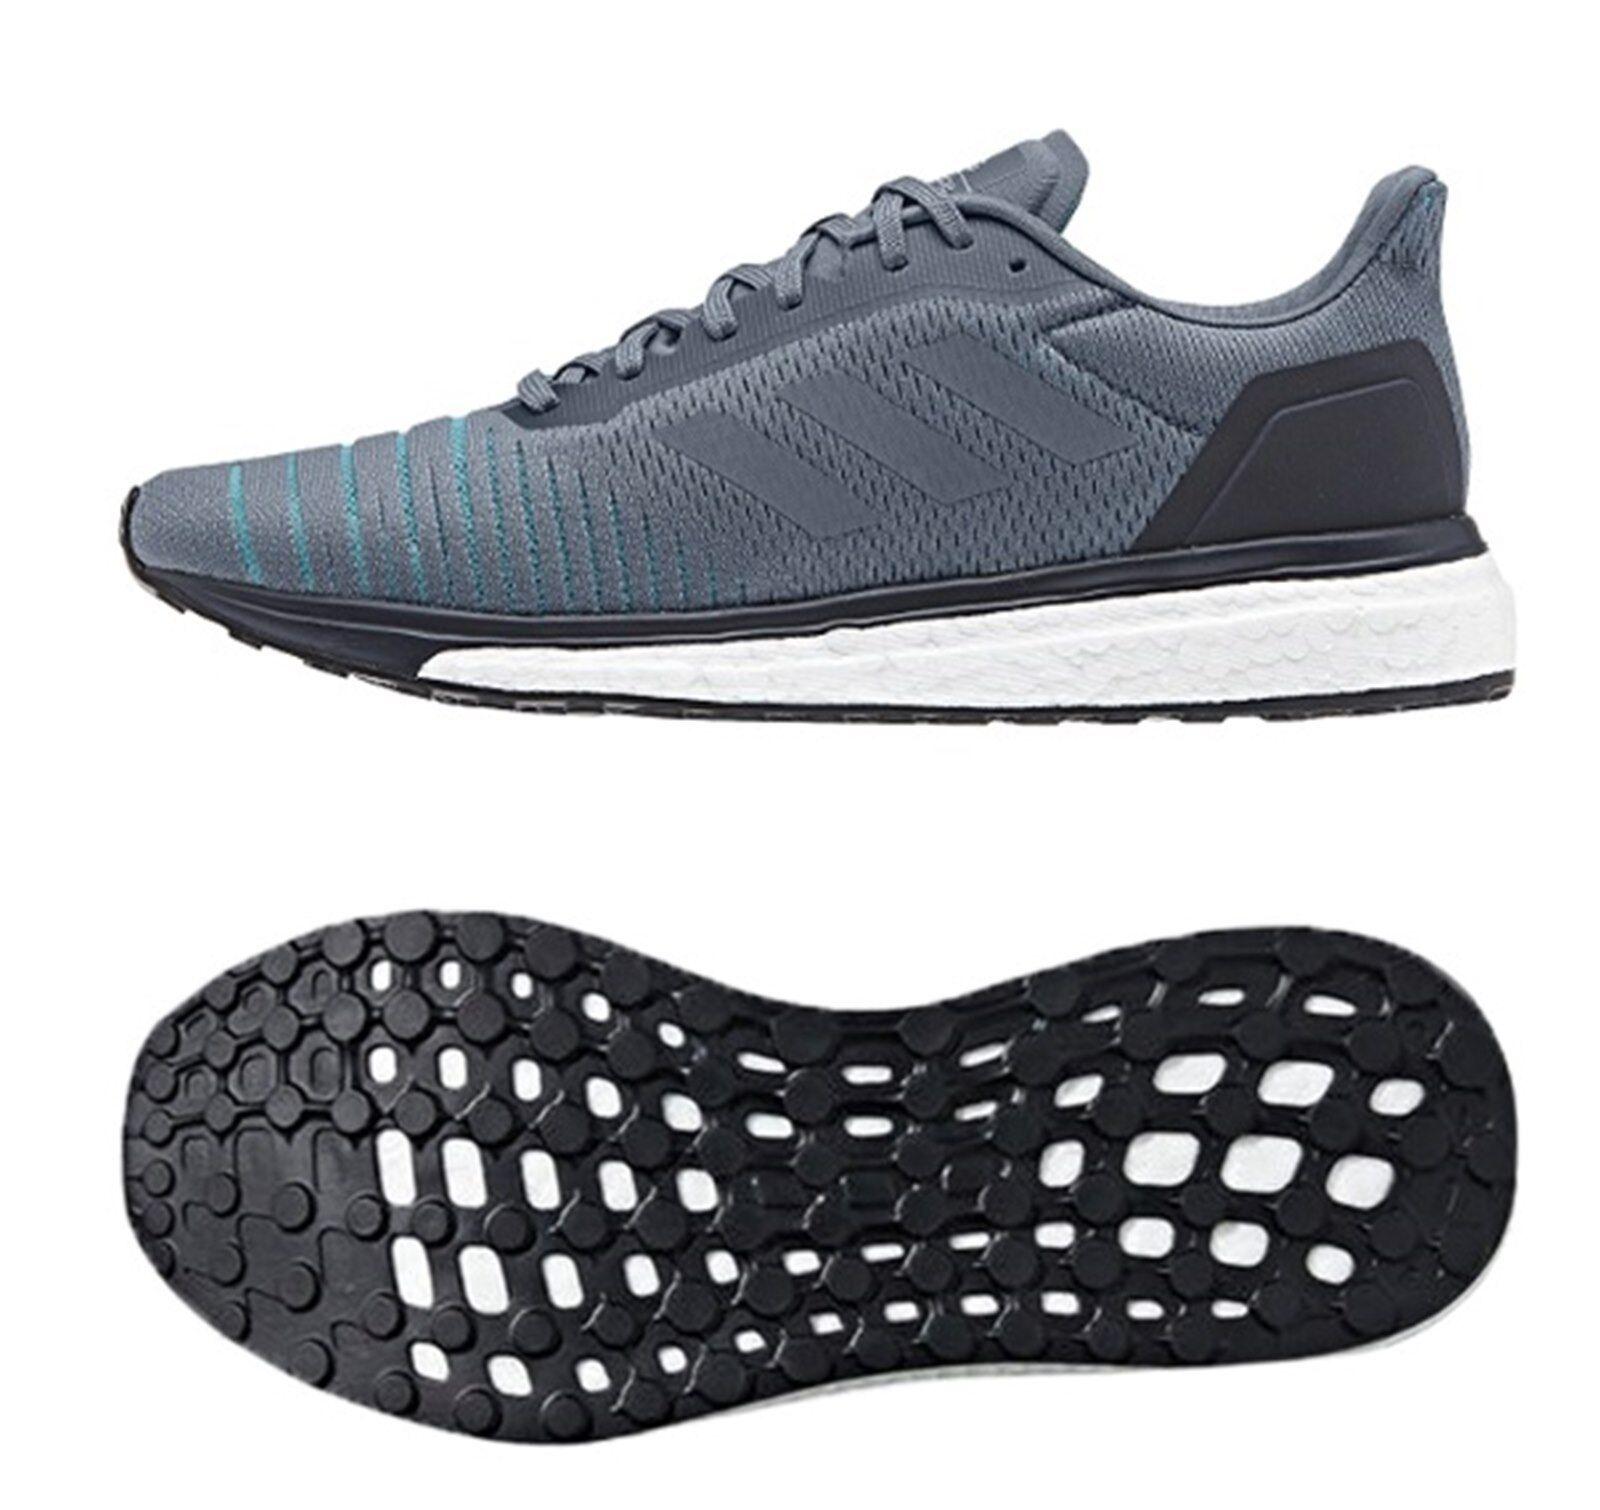 Adidas mannen Solar Drive Training schoenen hardlopen Navy wit sportschoenen schoen AC8133